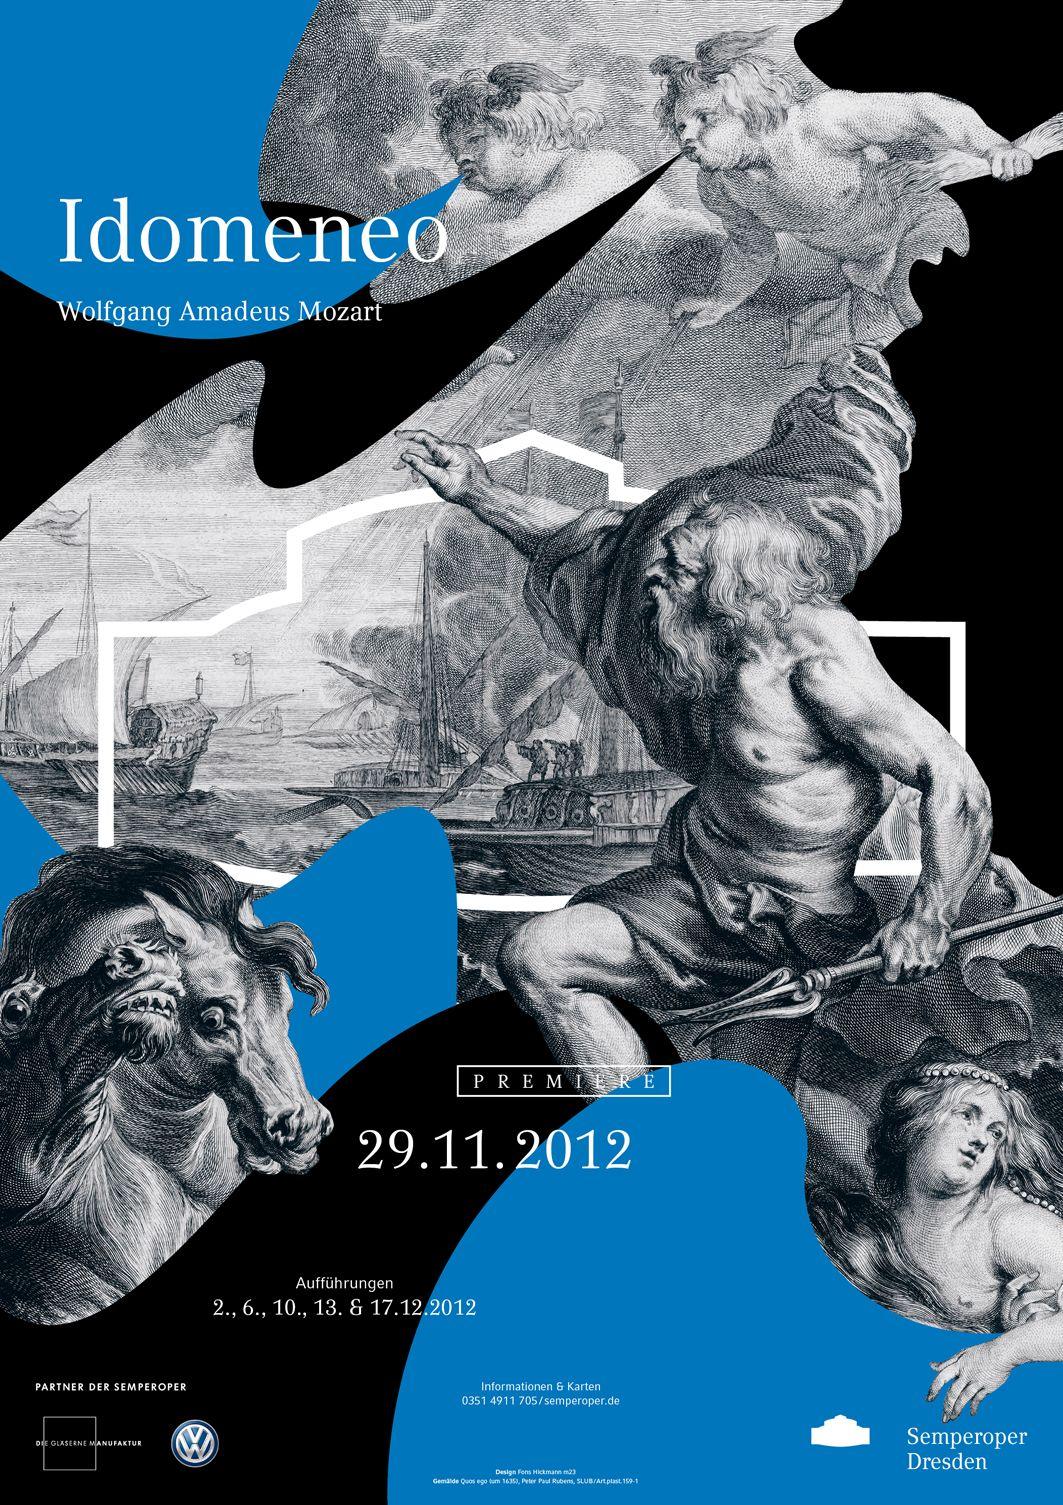 Plakatkampagne Der Semperoper Dresden Semperoper Dresden Grafische Poster Semper Oper